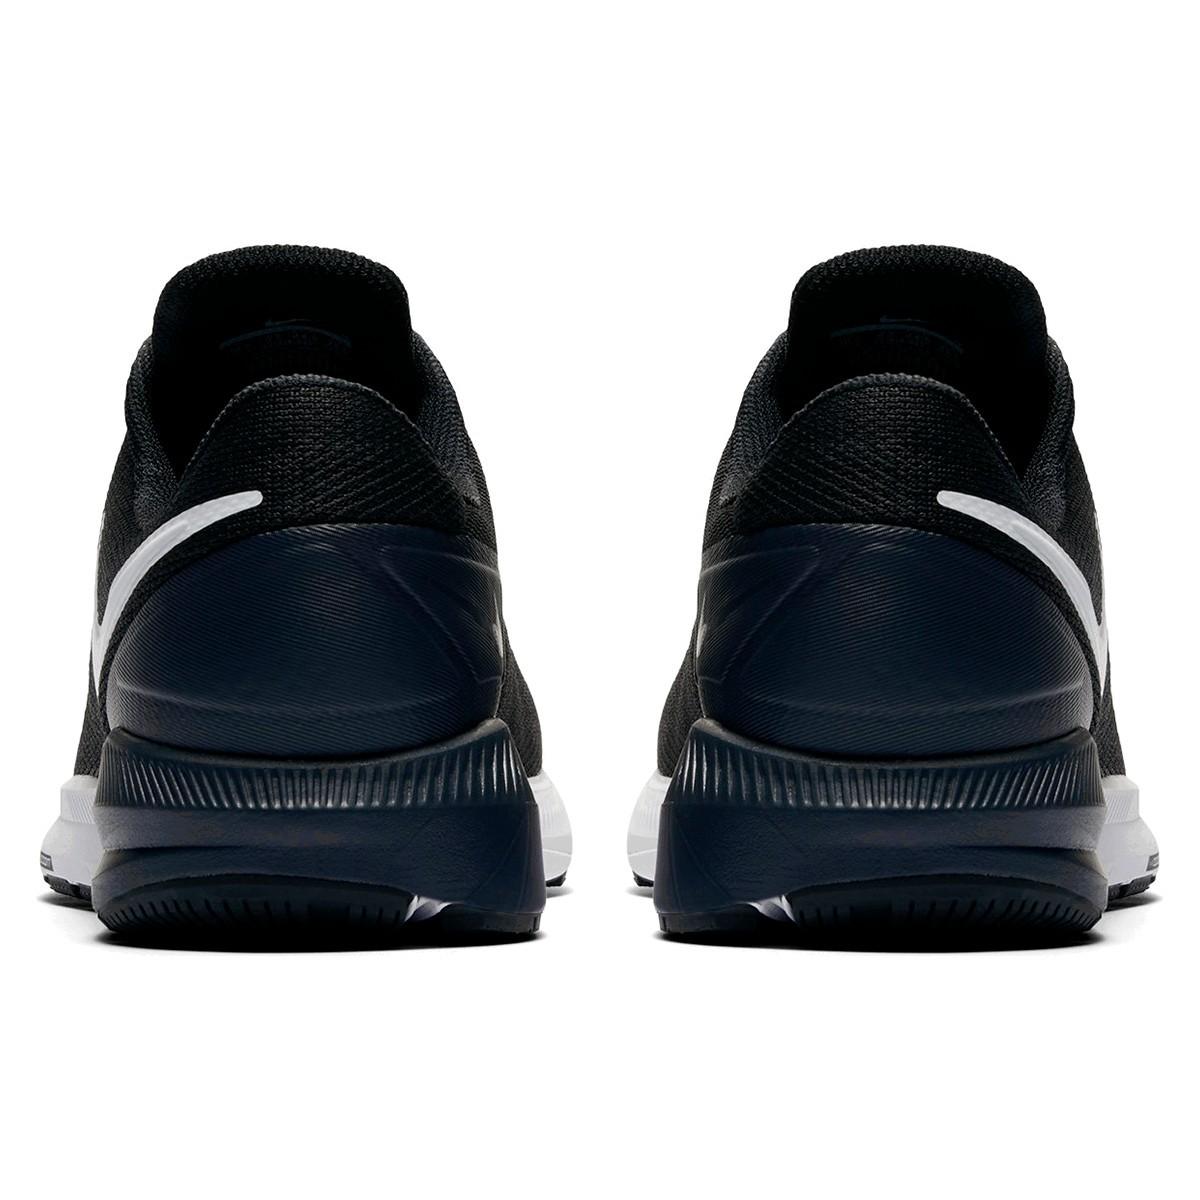 Tênis Nike Air Zoom Structure 22 Feminino Preto